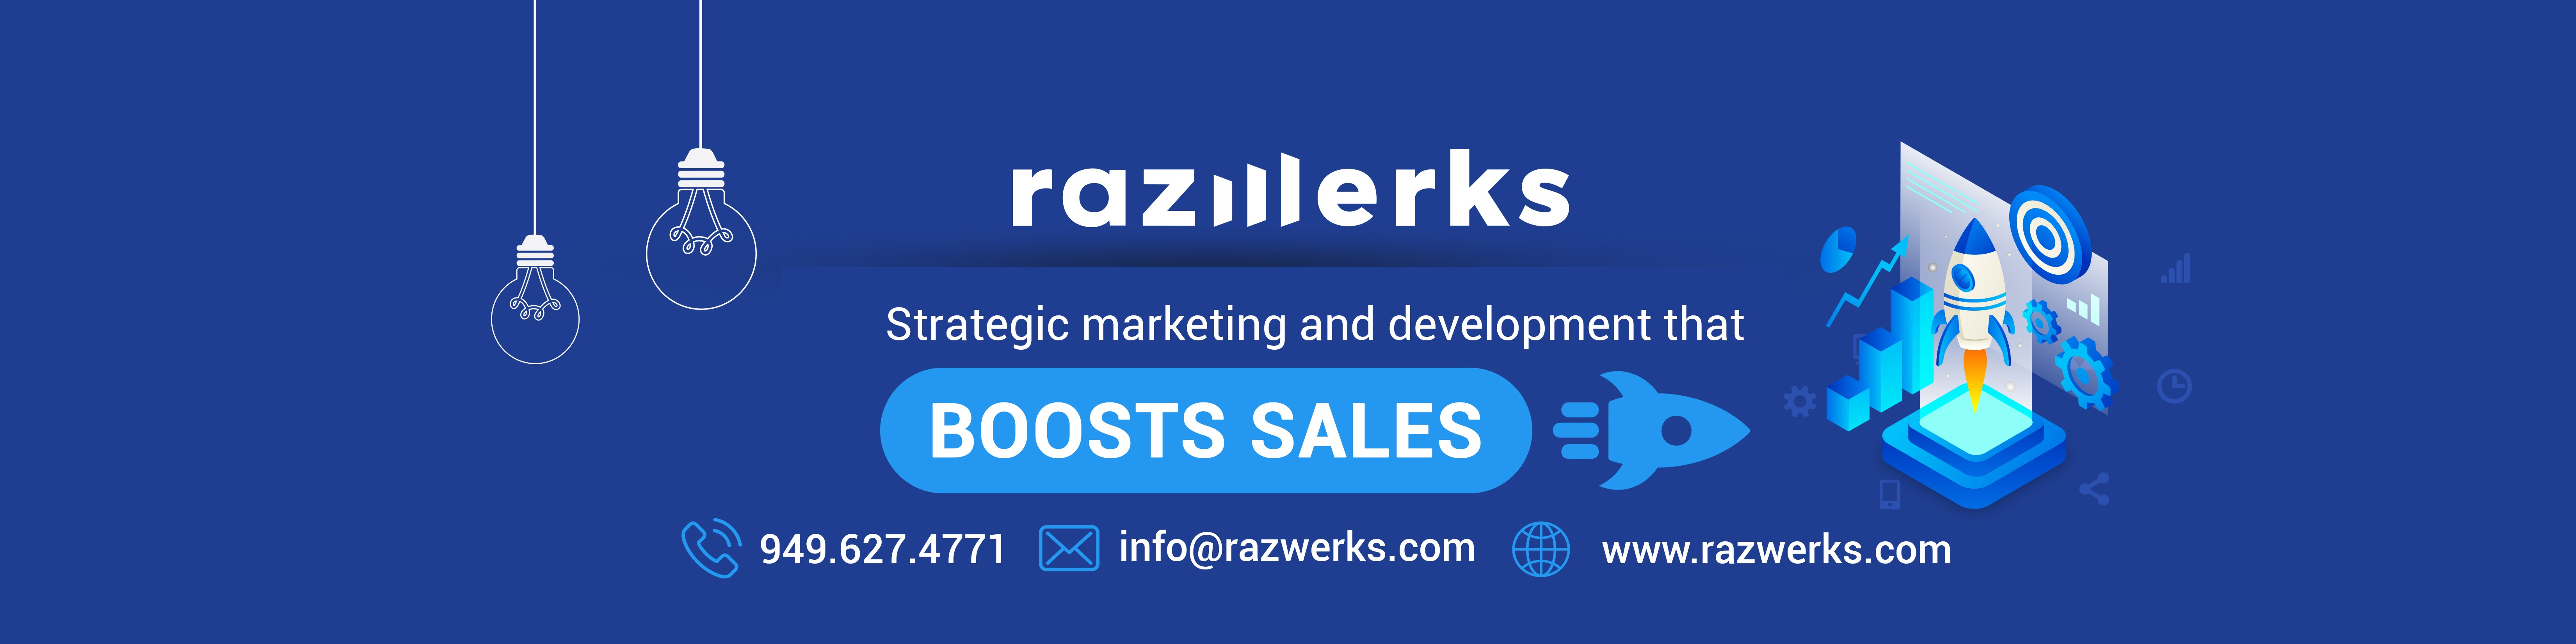 Razwerks Orange County Seo Company Digital Marketing Agency Web Design Branding Google Adwords Linkedin